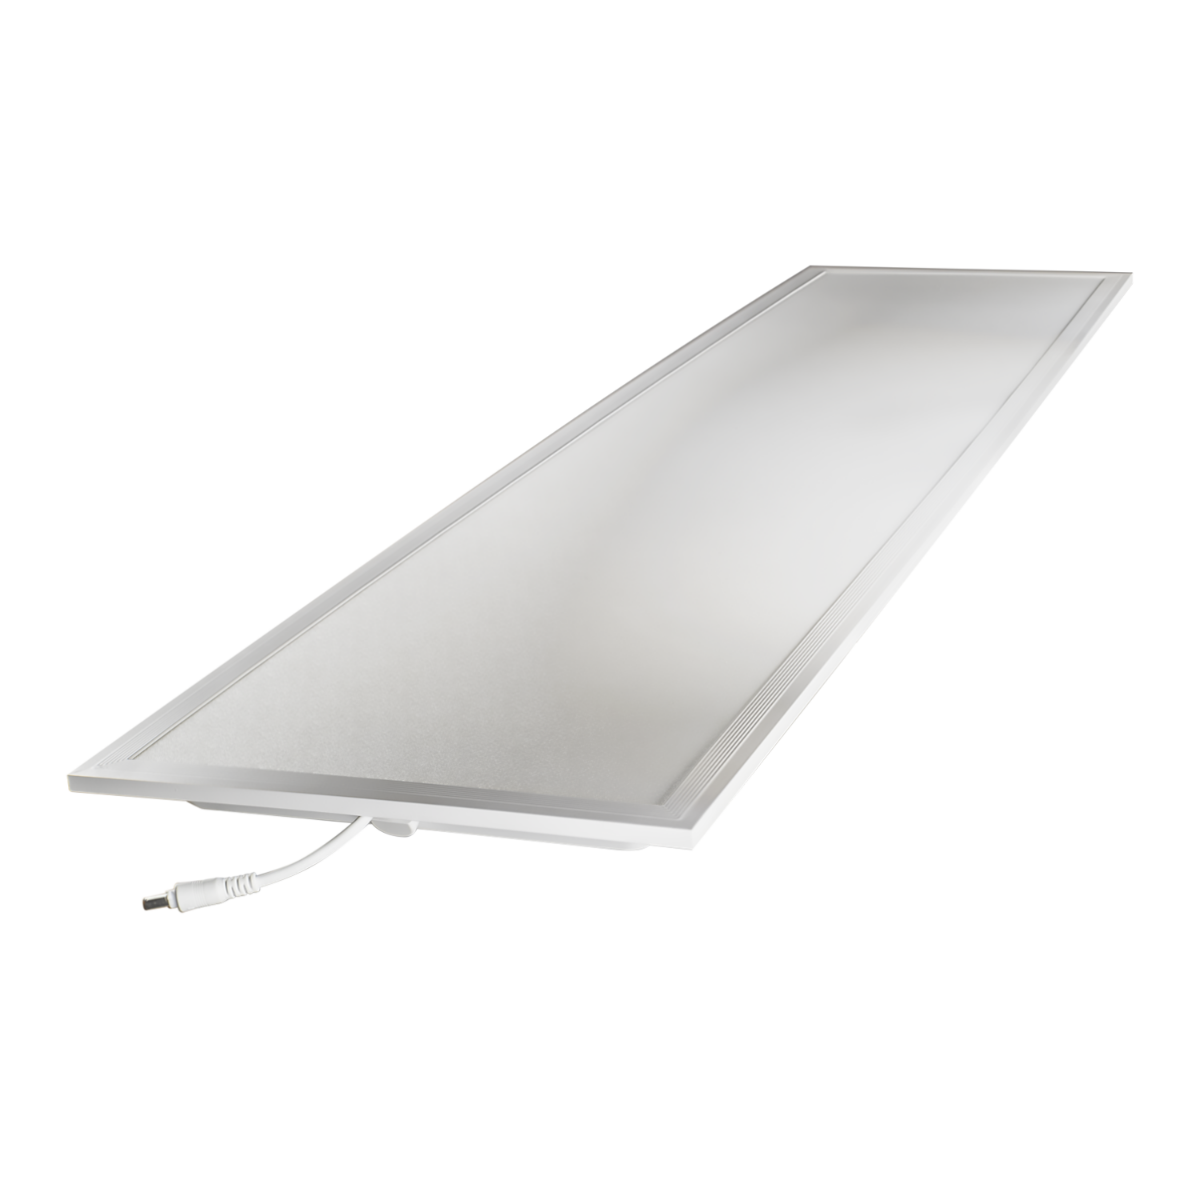 Noxion LED Paneel Econox 32W Xitanium DALI 30x120cm 6500K 4400lm UGR <22   Dali Dimbaar - Daglicht - Vervangt 2x36W